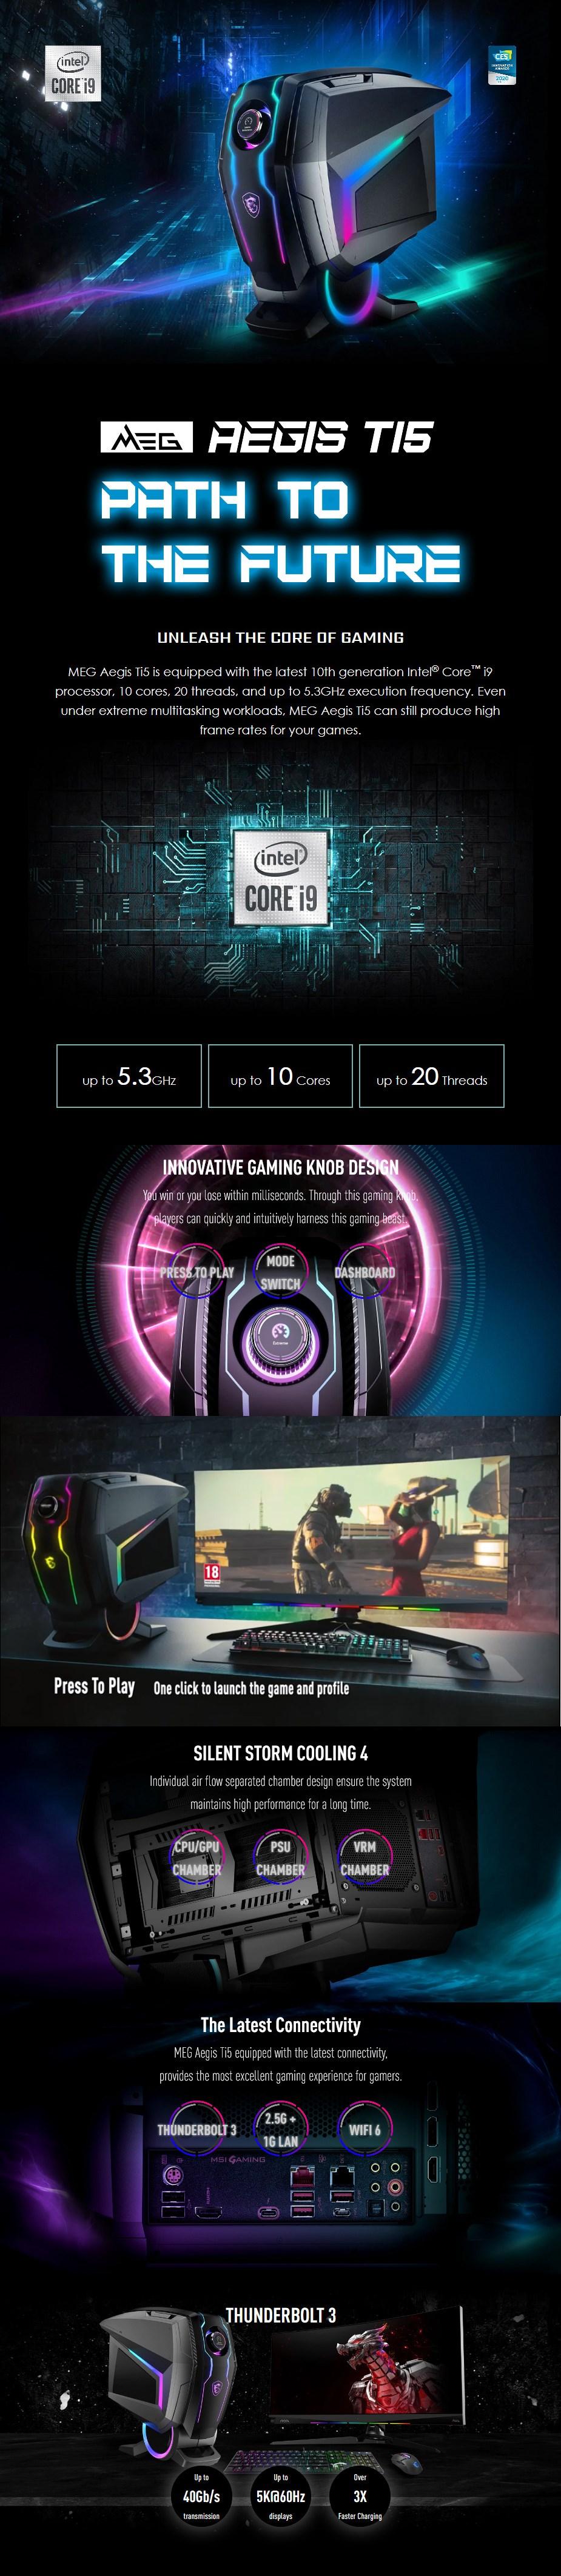 MSI MEG Aegis Ti5 Gaming PC i9-10900K 128GB 2TB SSD + 3TB HDD RTX3080 W10H - Overview 1